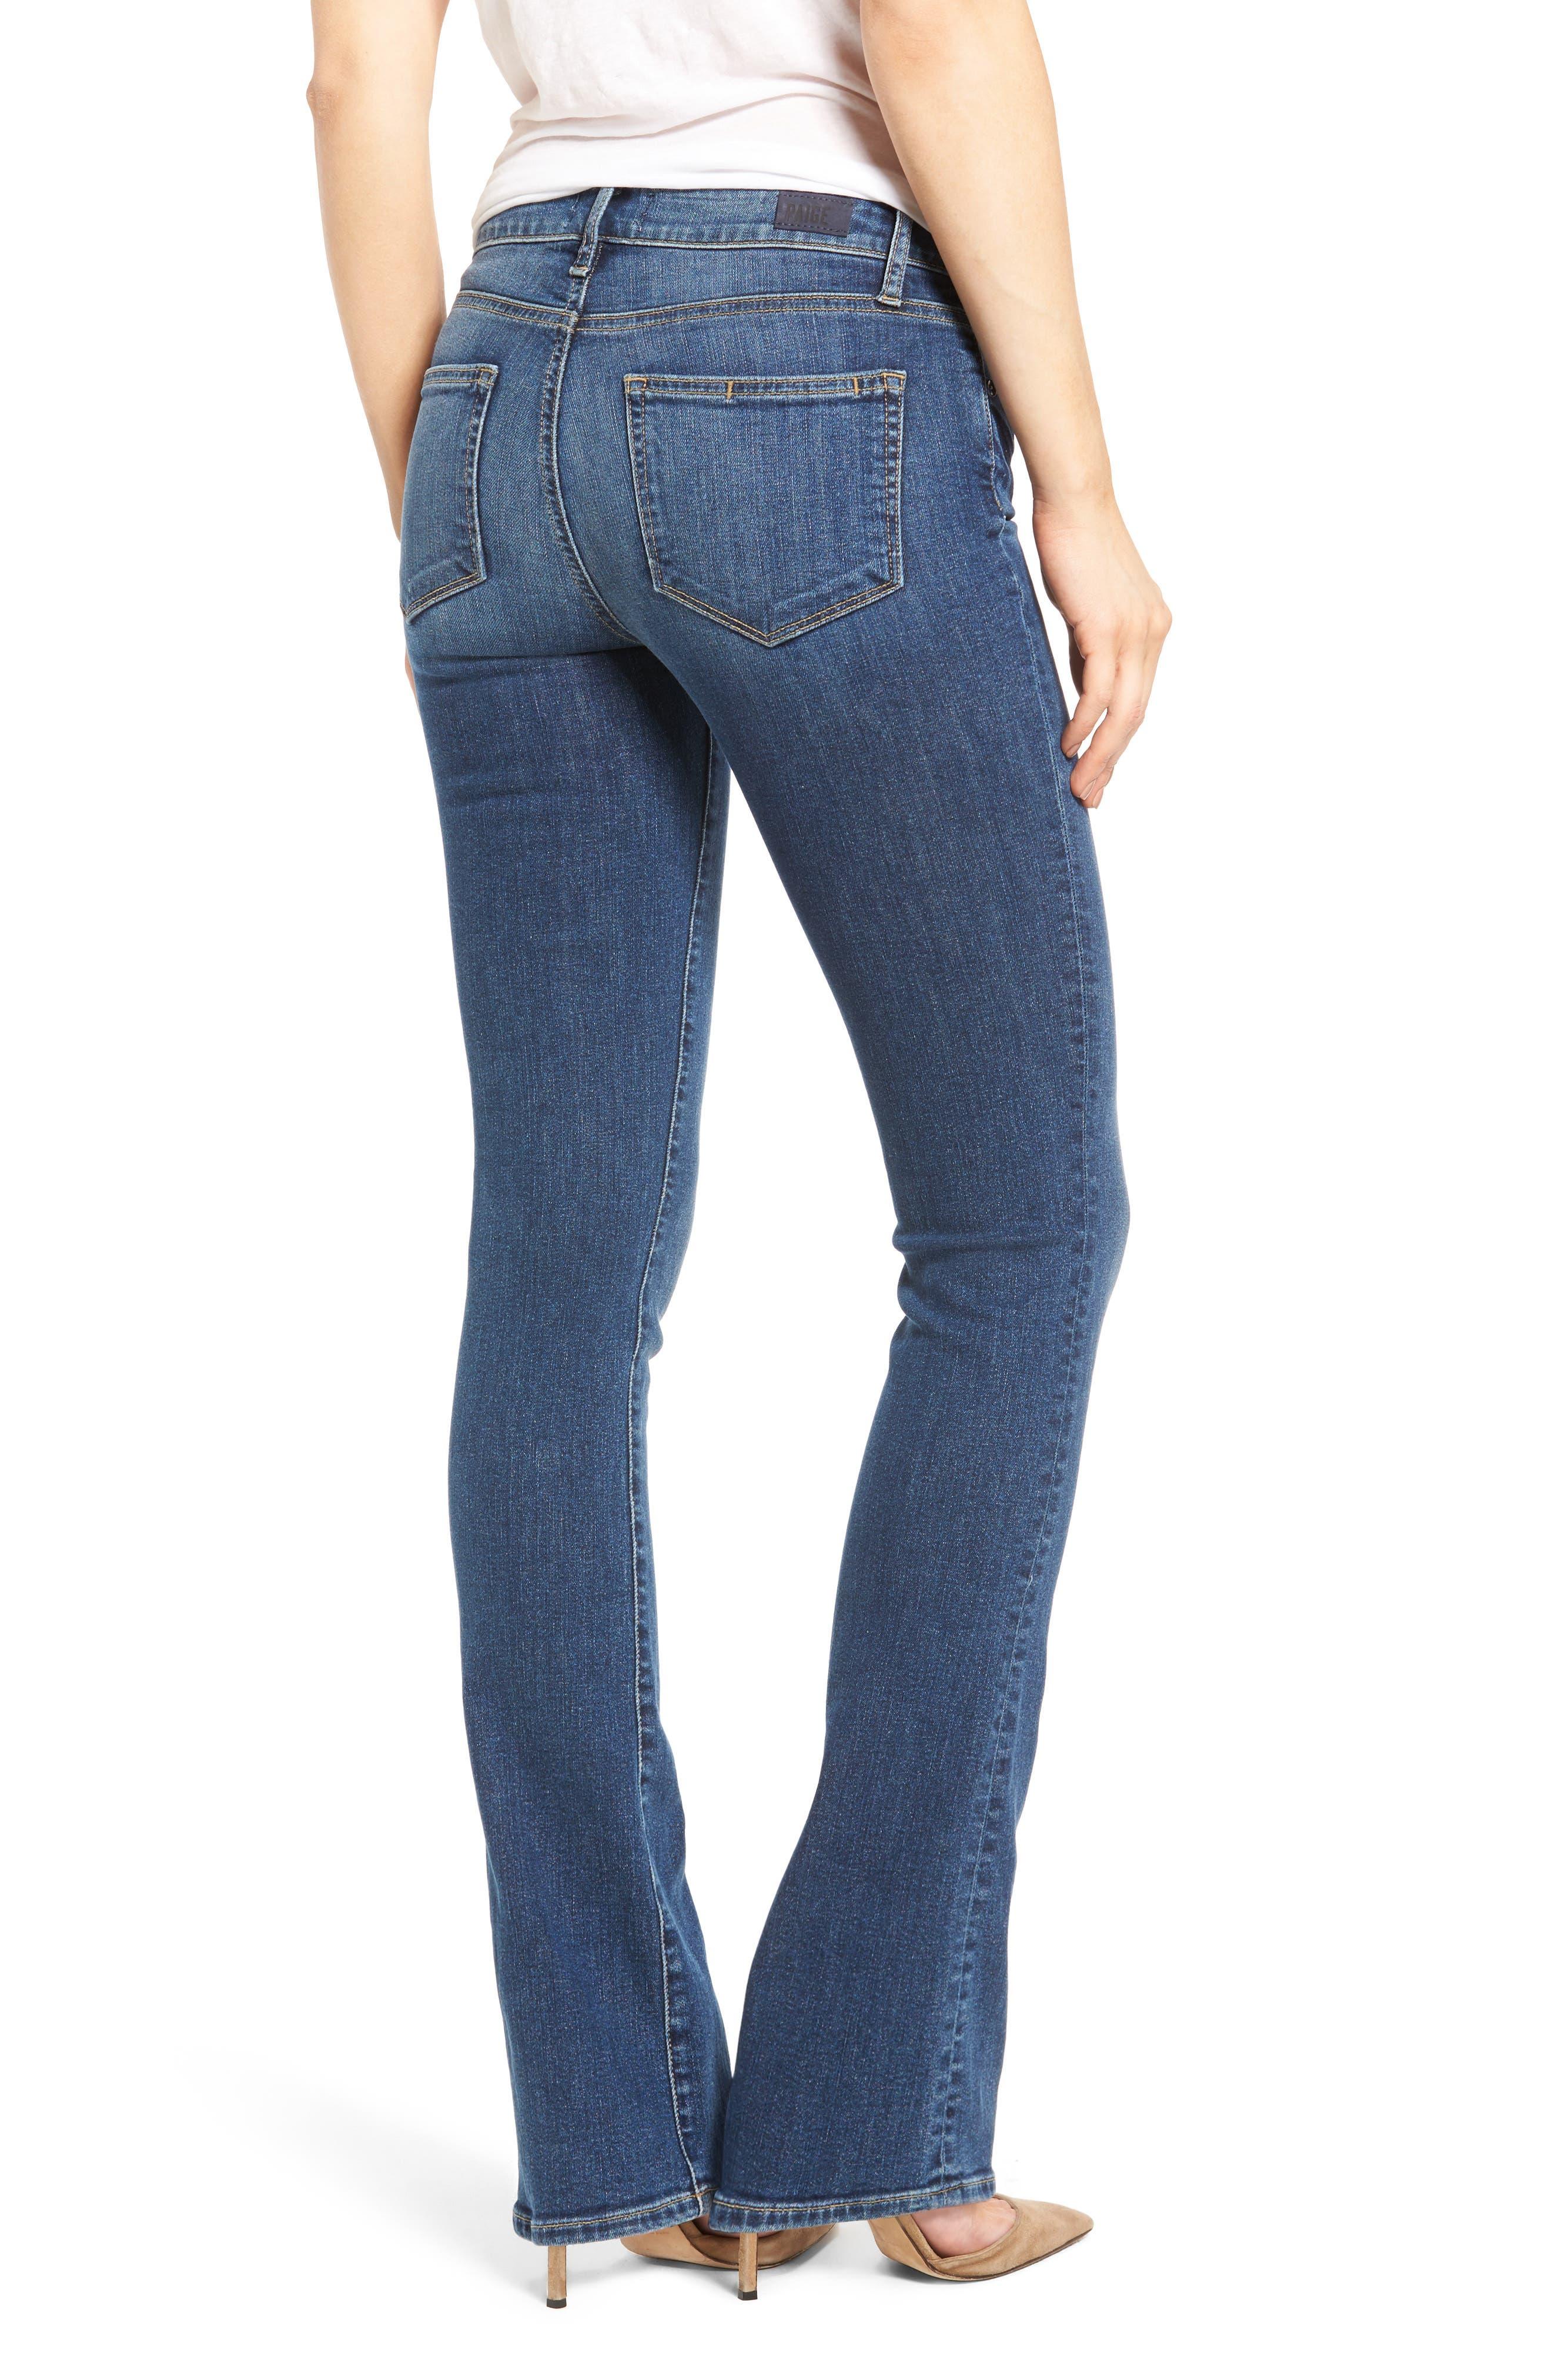 Transcend - Manhattan Bootcut Jeans,                             Alternate thumbnail 2, color,                             400